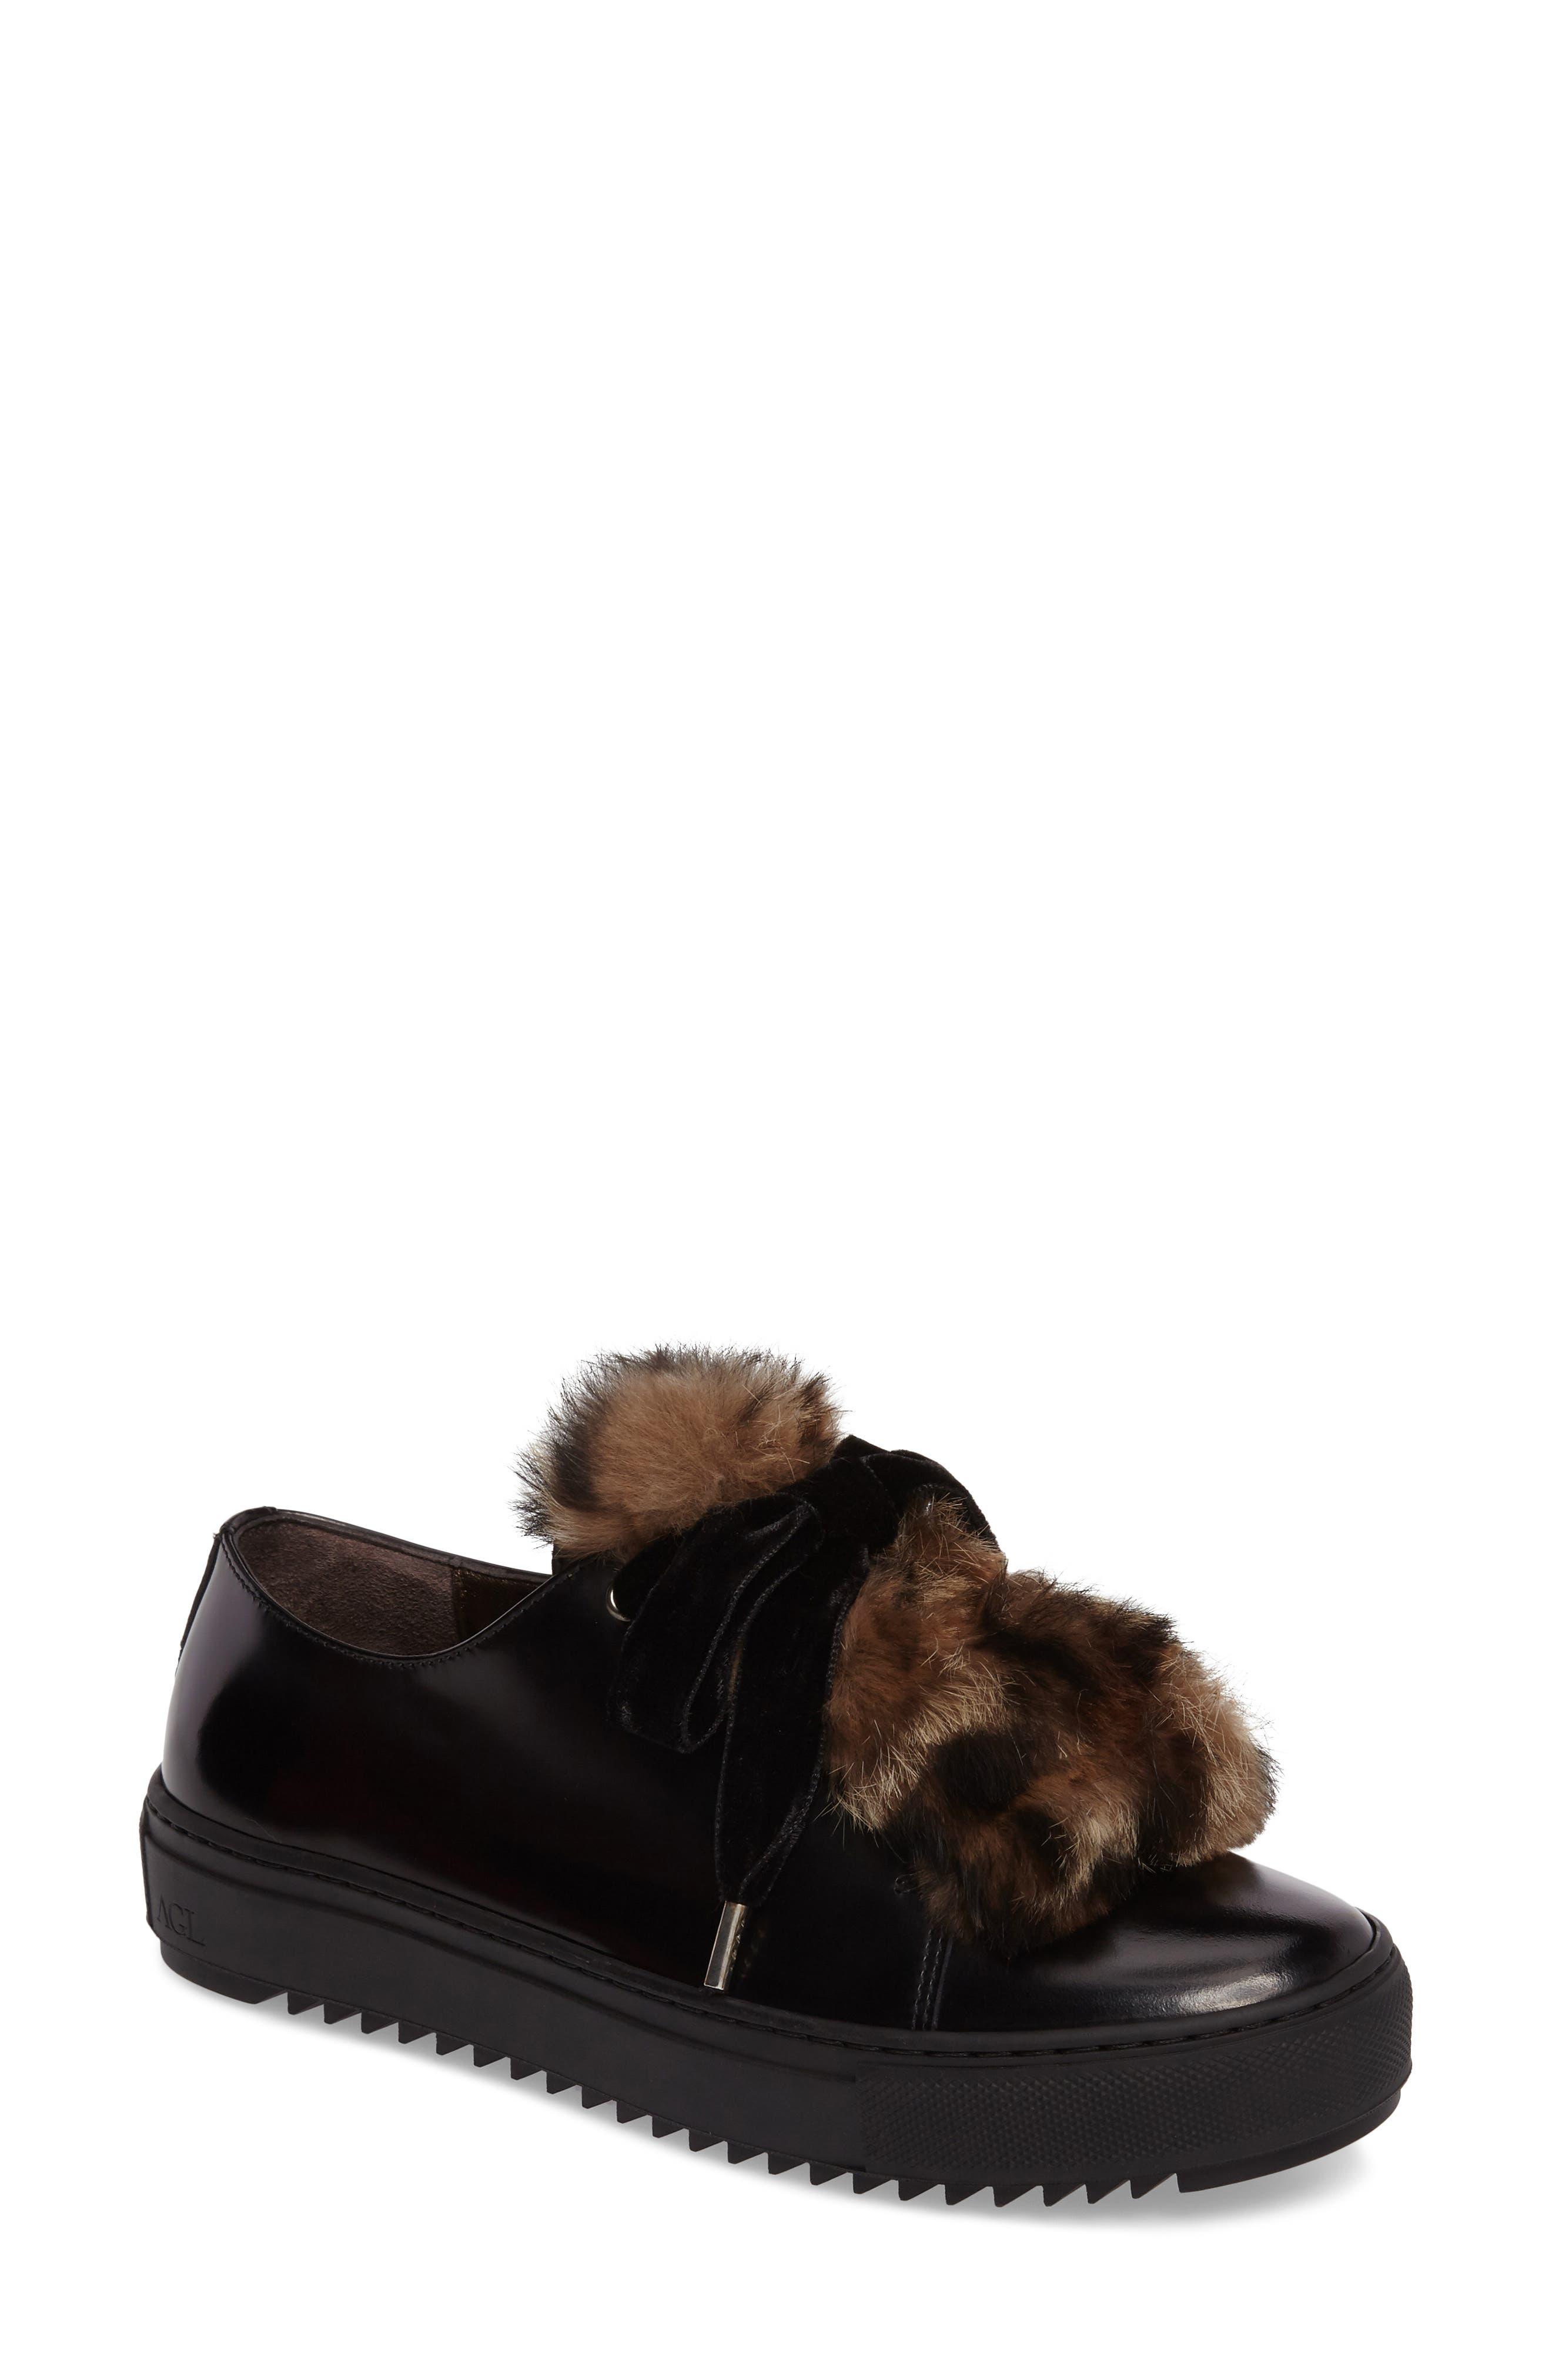 Fluff Genuine Rabbit Fur Sneaker,                             Main thumbnail 1, color,                             001